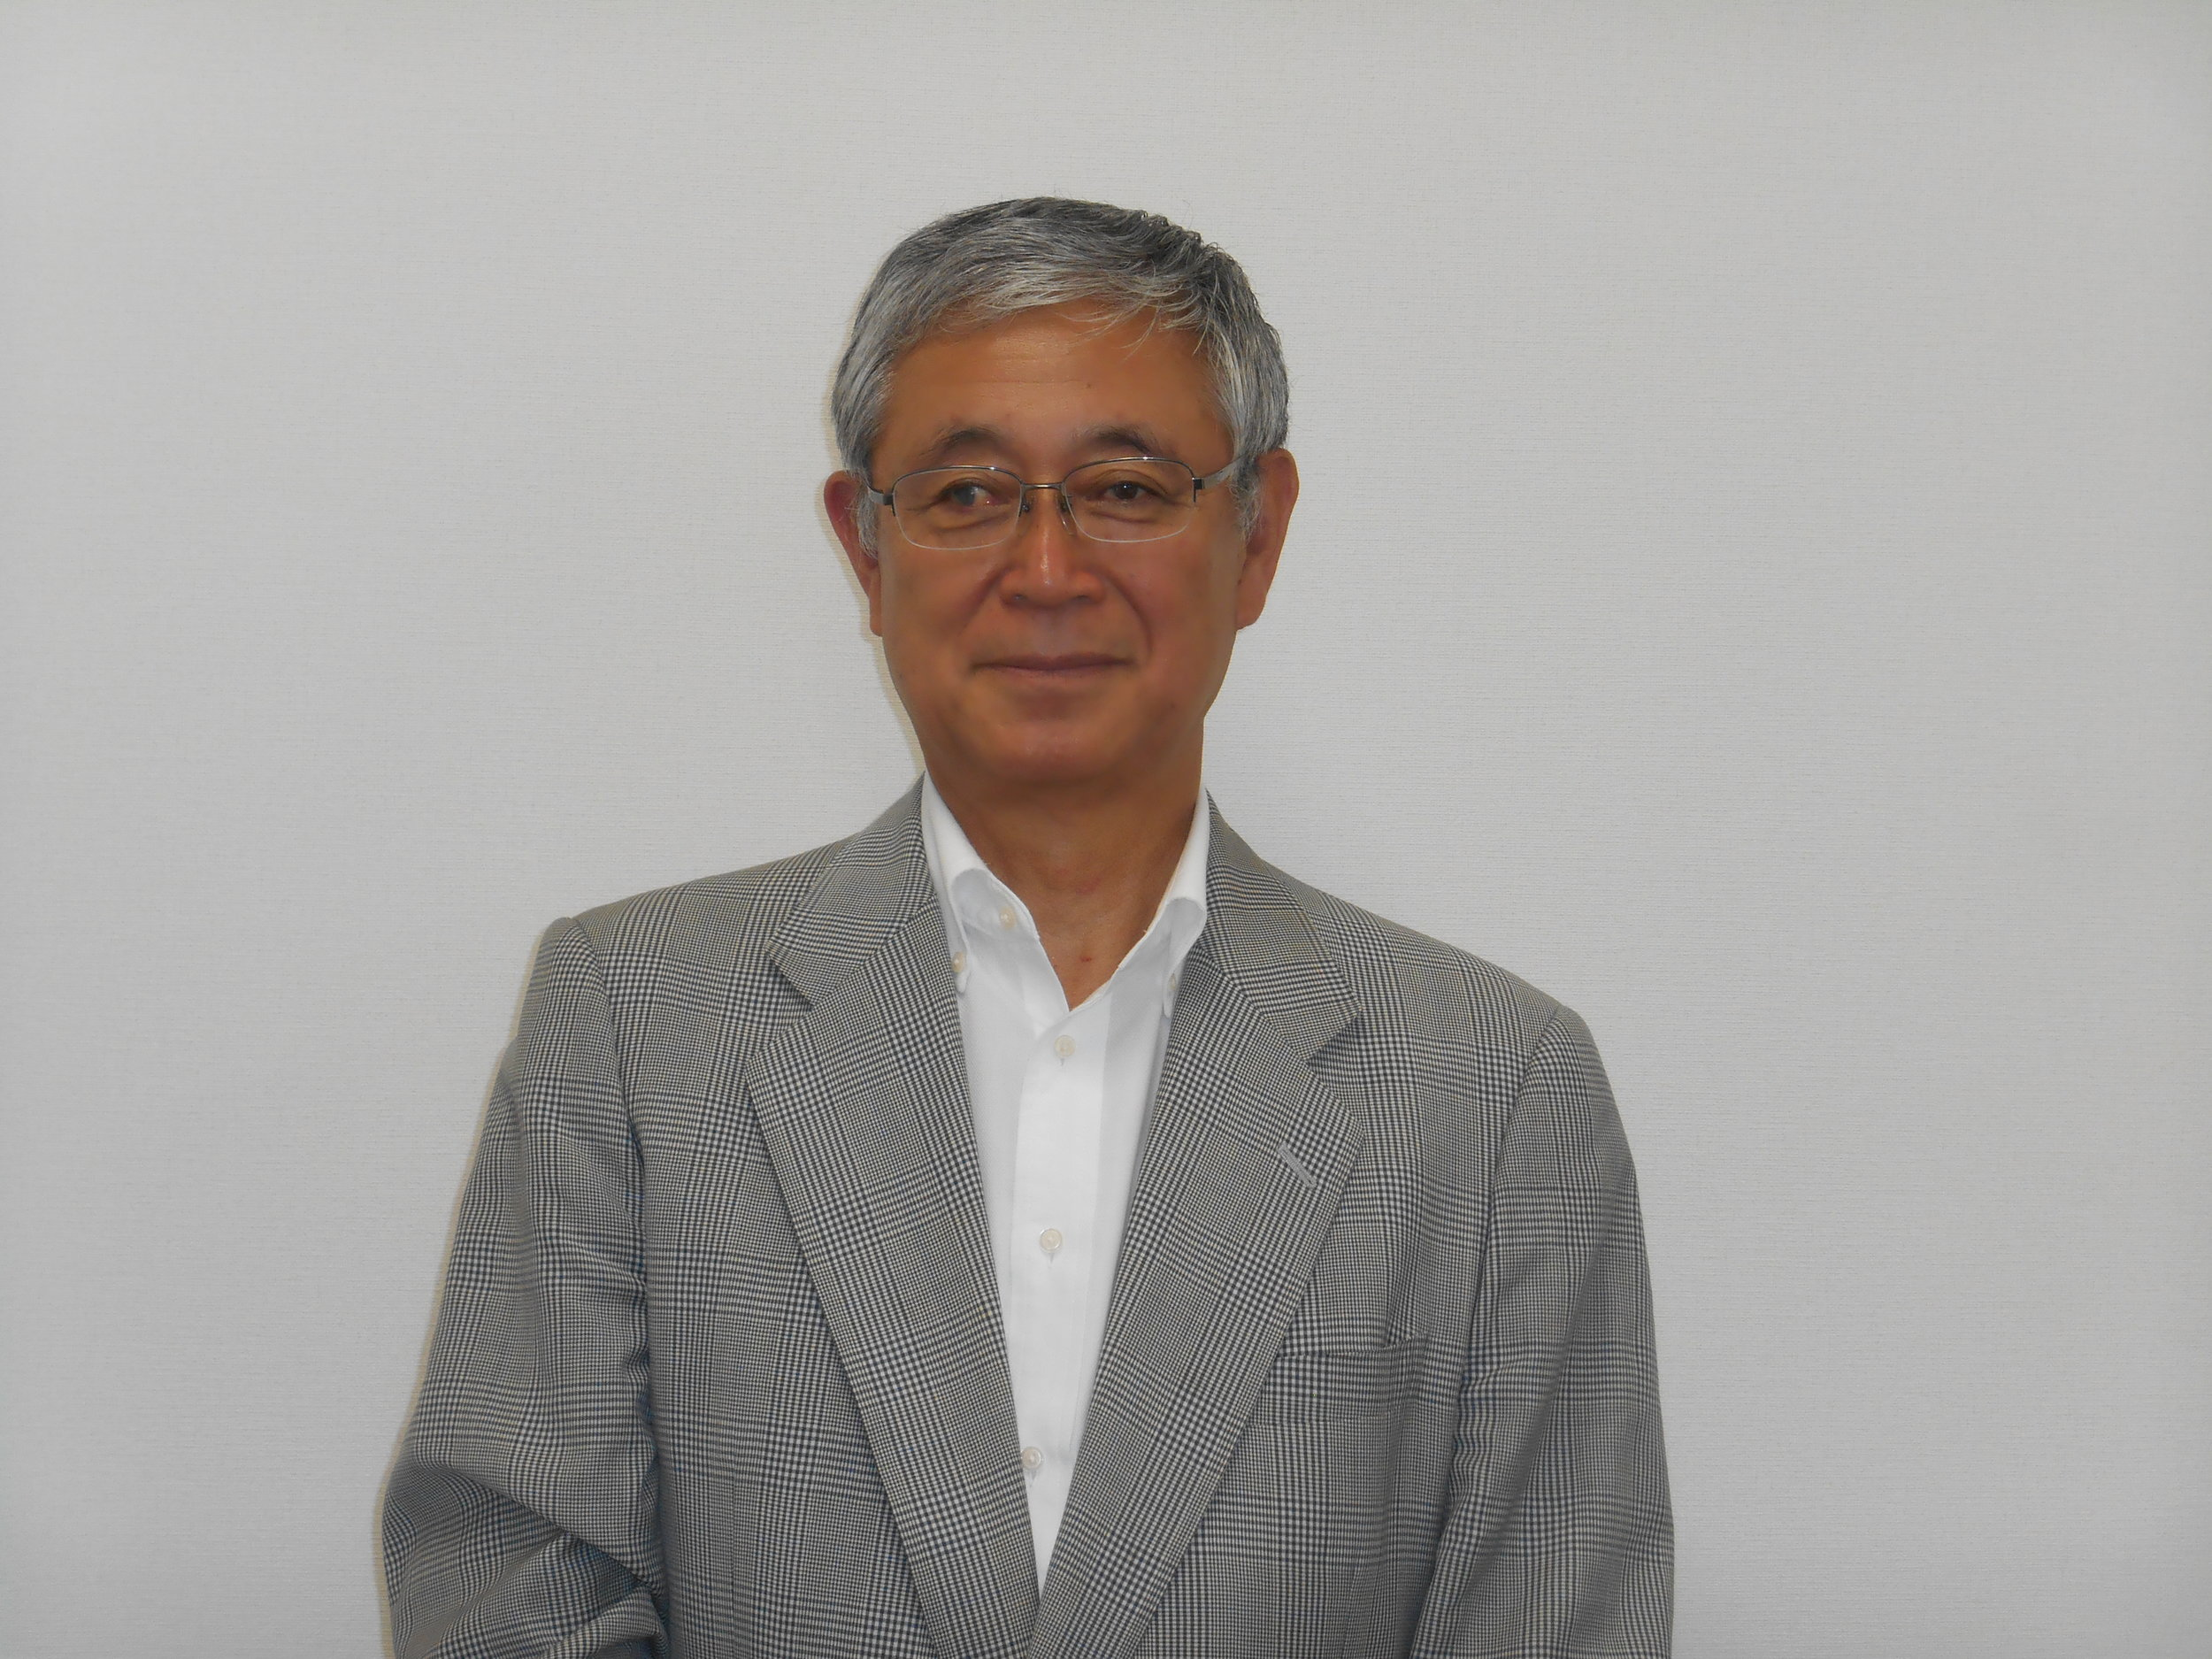 DSCN0689 - Minoru Ihara.JPG